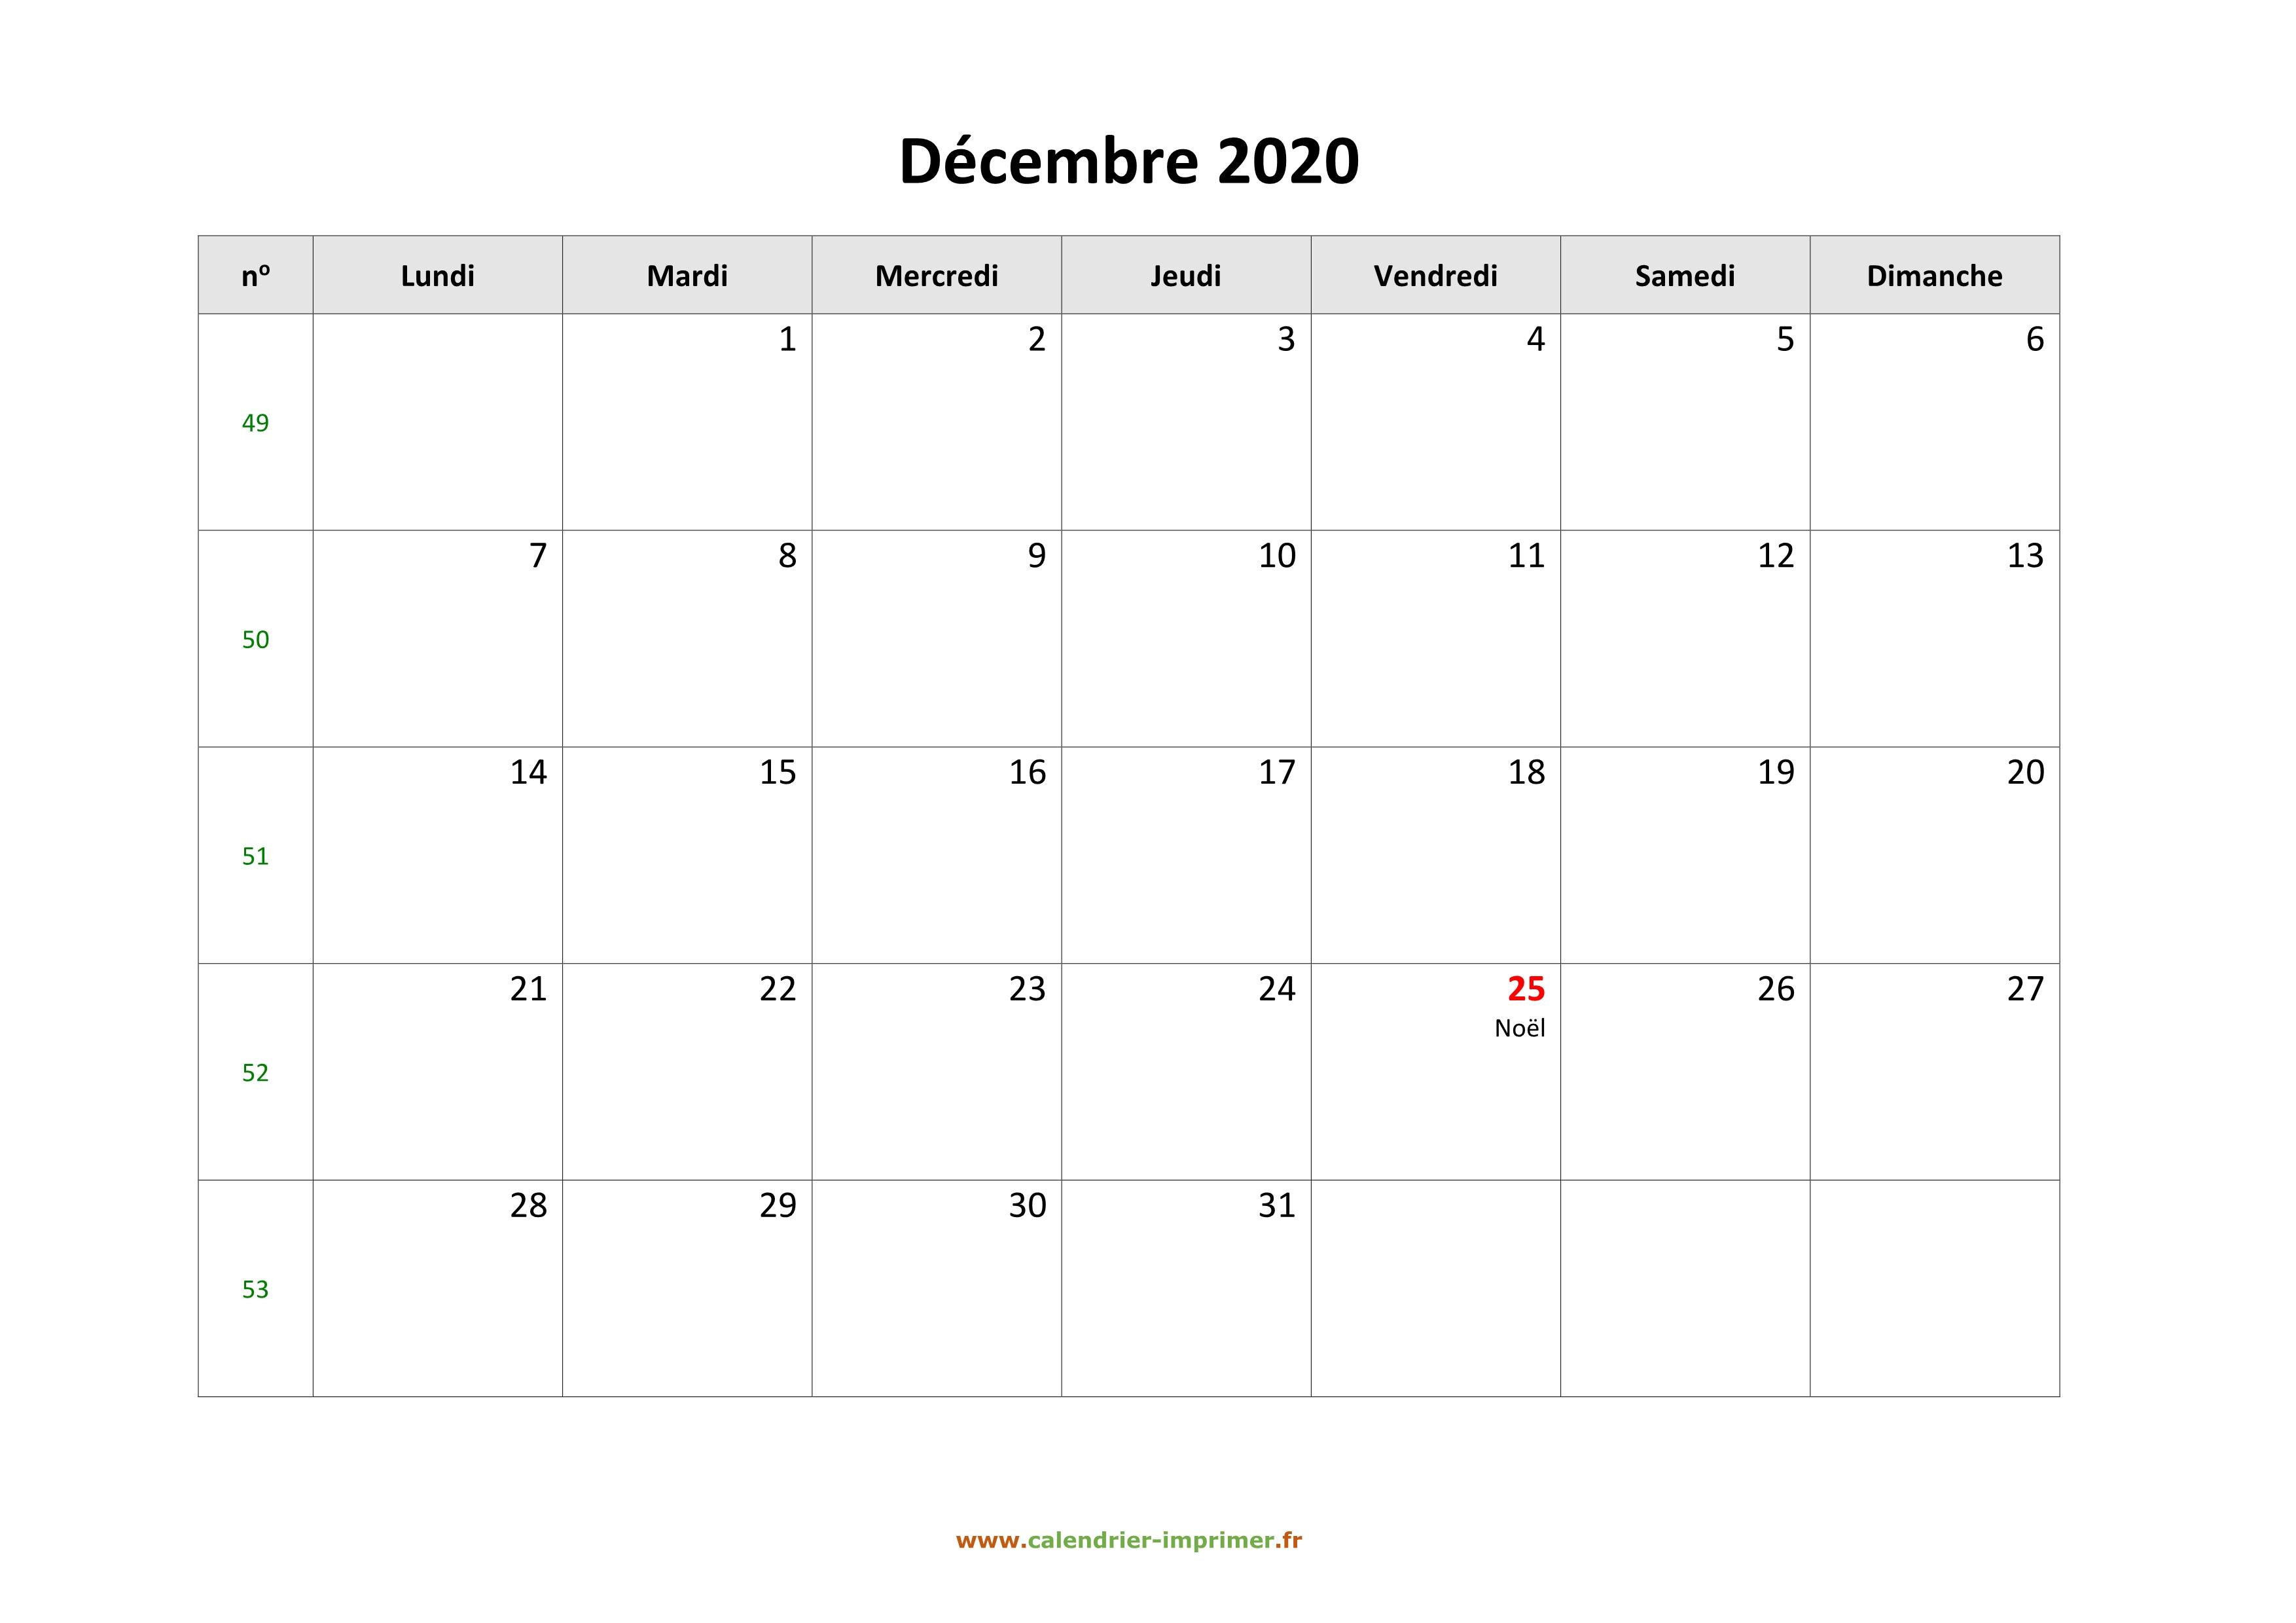 Calendrier De Decembre 2020.Calendrier Decembre 2020 A Imprimer